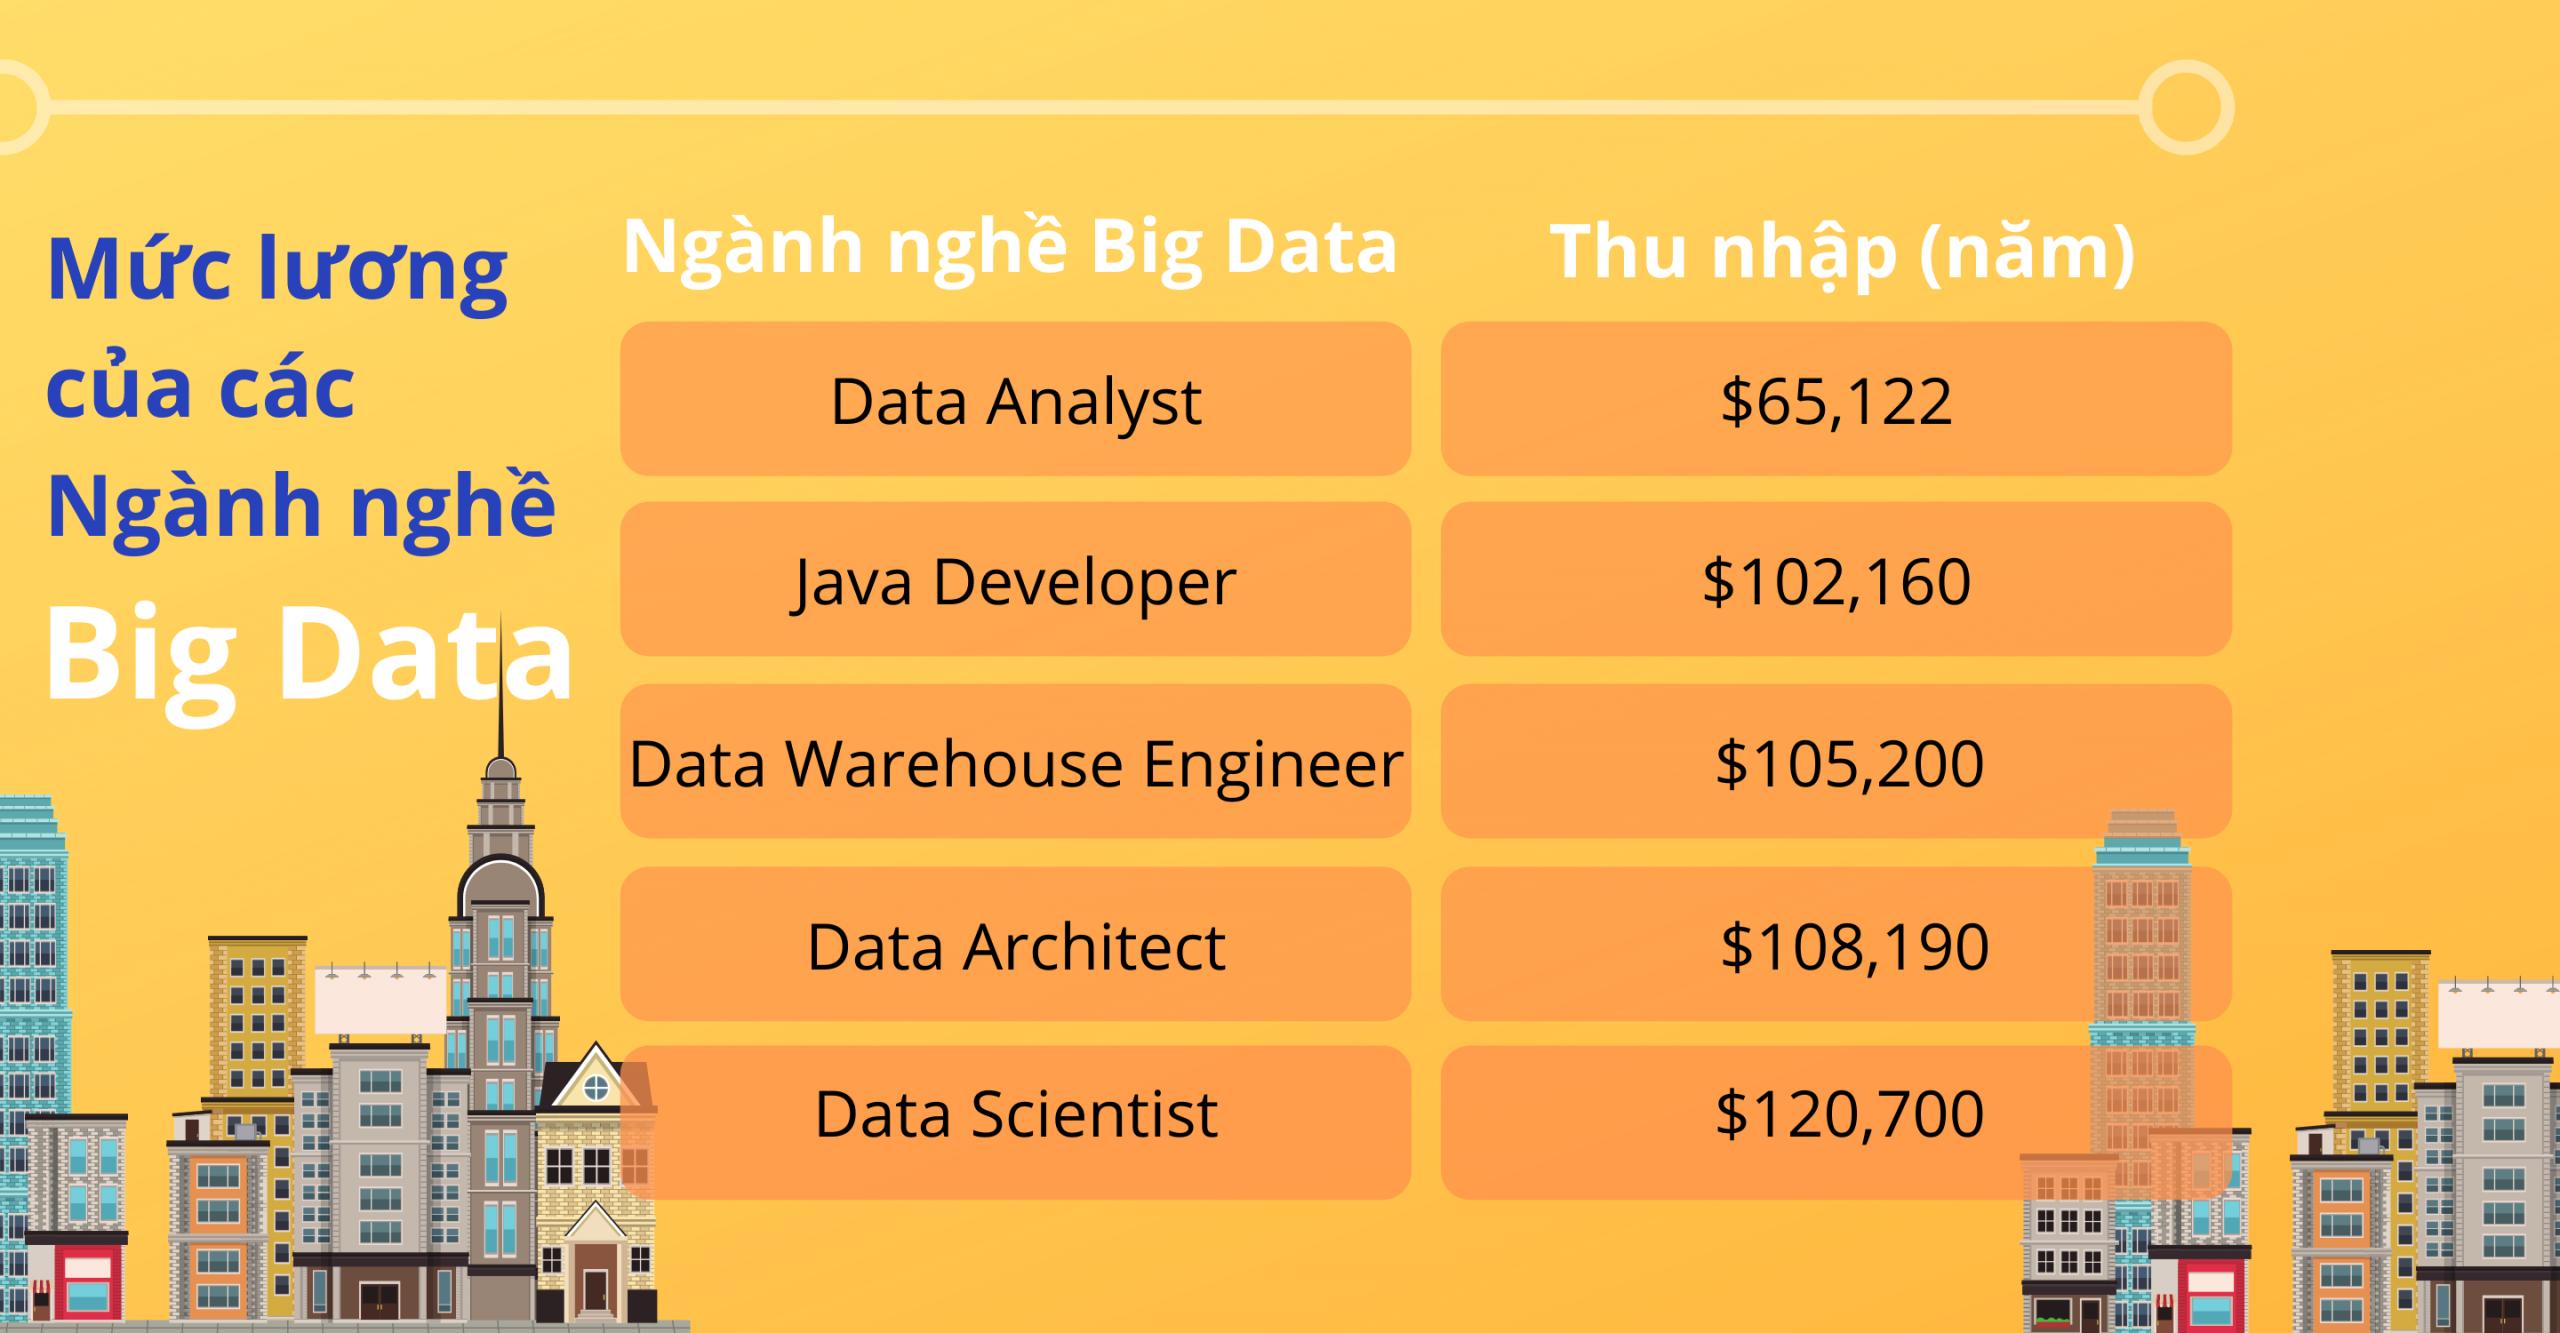 VienISB_nhu-cau-nganh-nghe-big-data-1